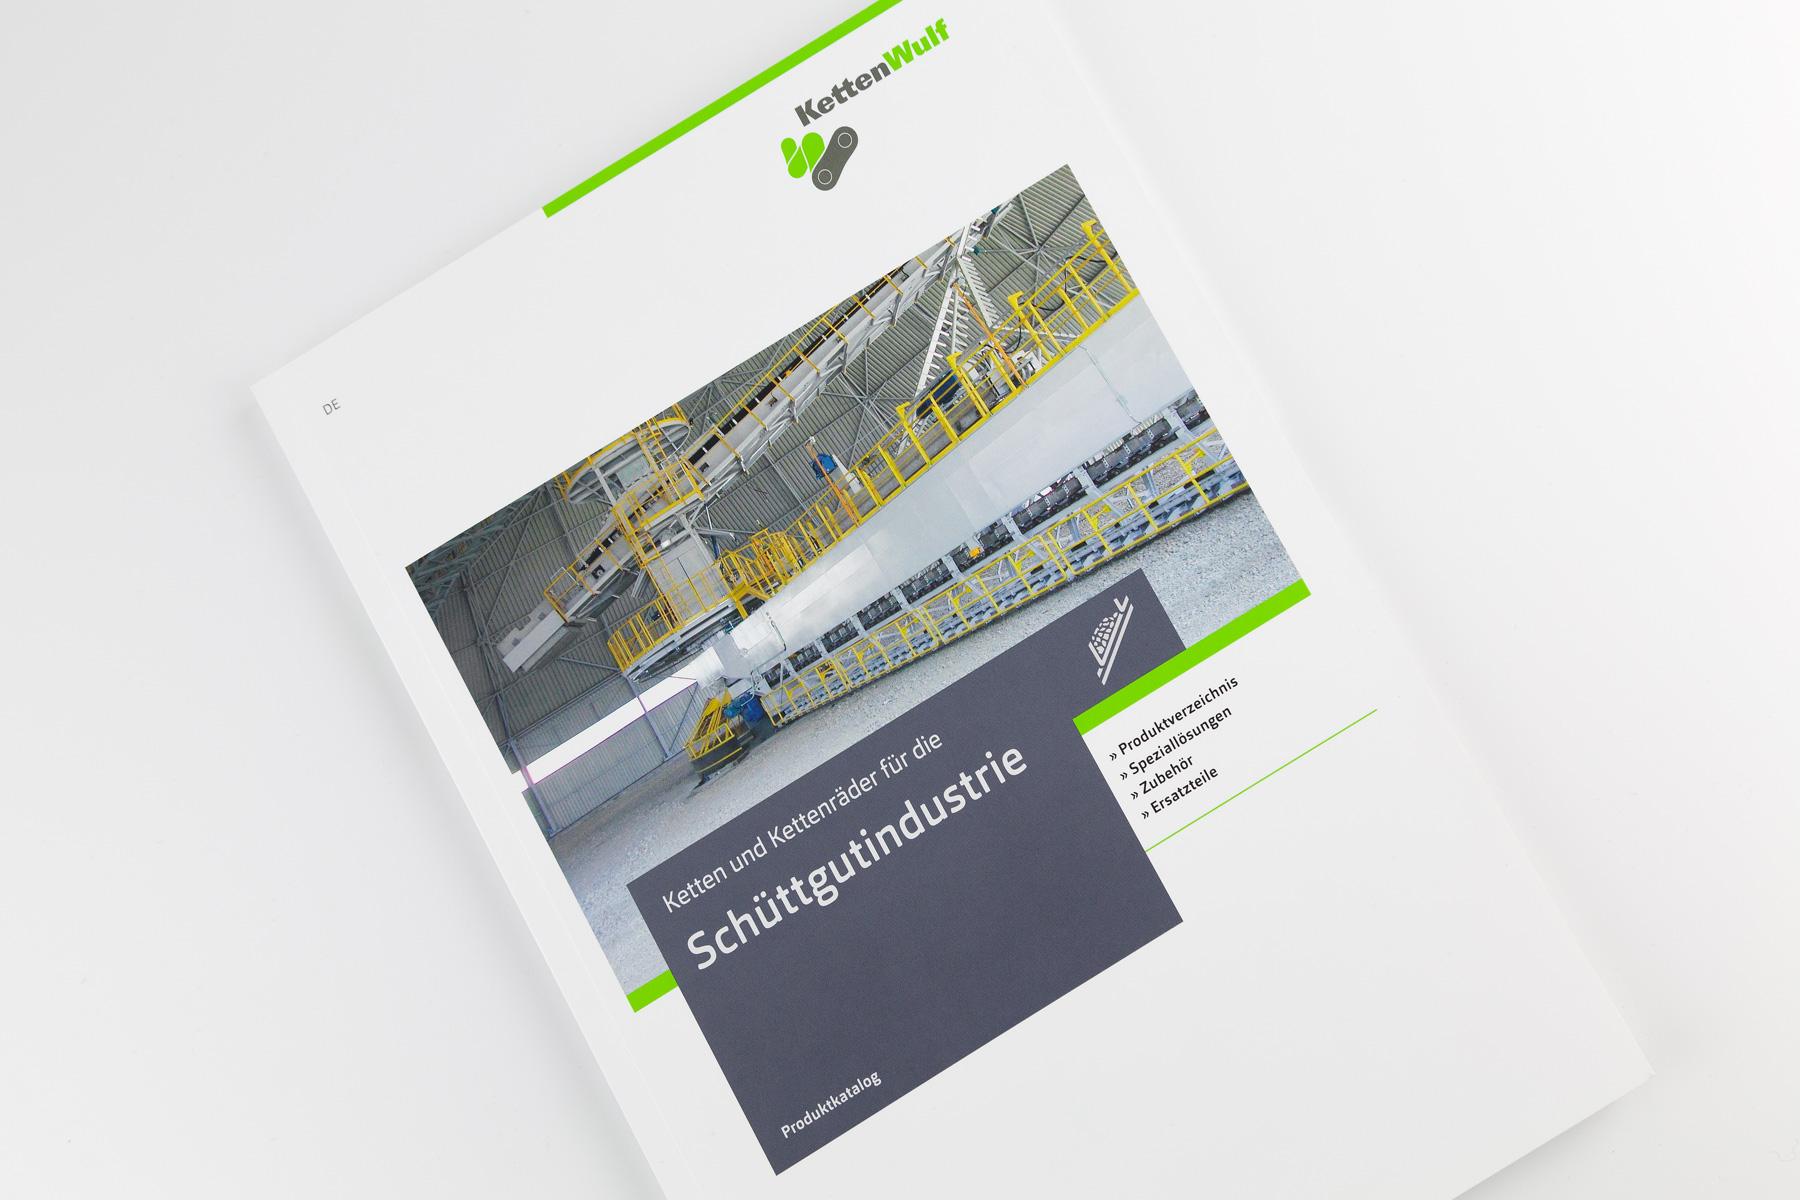 KettenWulf_Schüttgutbroschüre_6